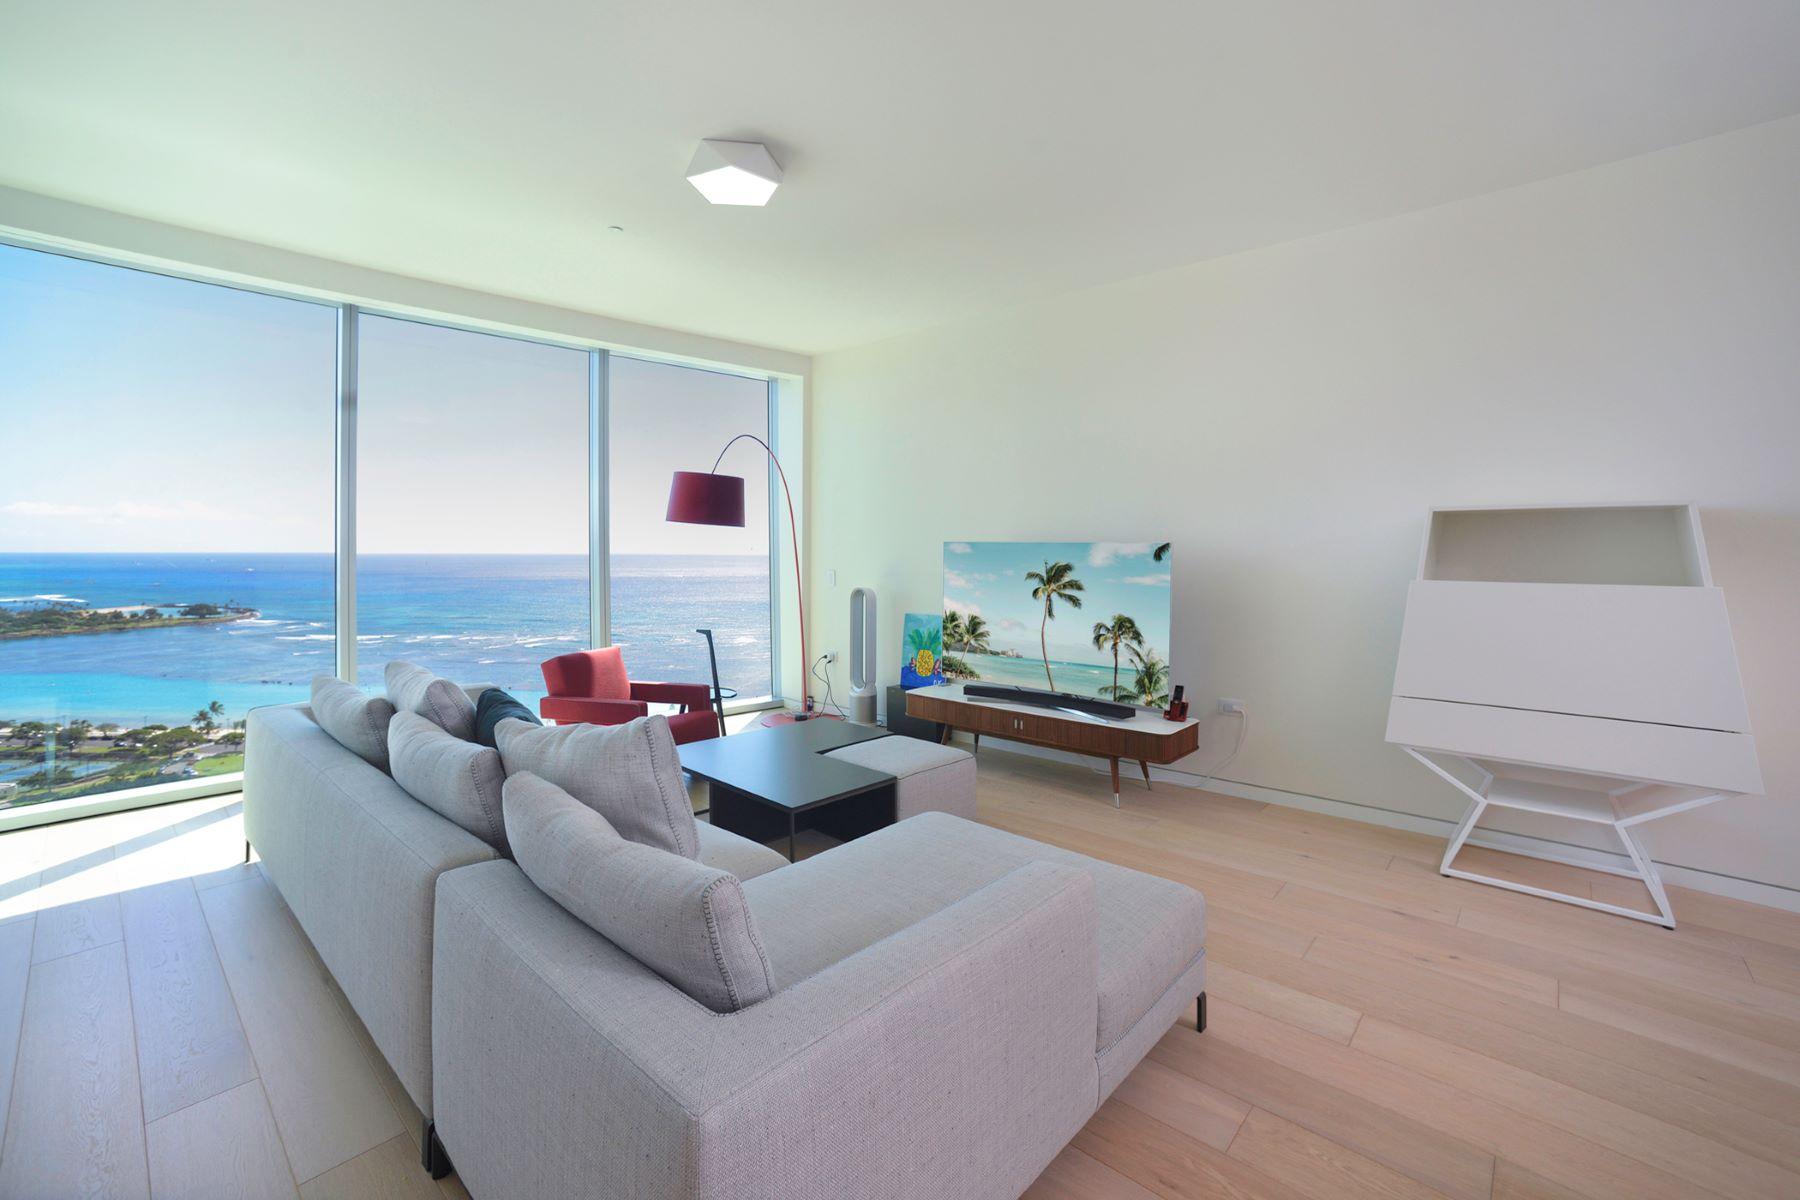 Condominiums for Sale at Waiea Condo, Luxury Condo, Ocean View, Diamond Head View 1118 Ala Moana Boulevard #2602 Honolulu, Hawaii 96814 United States